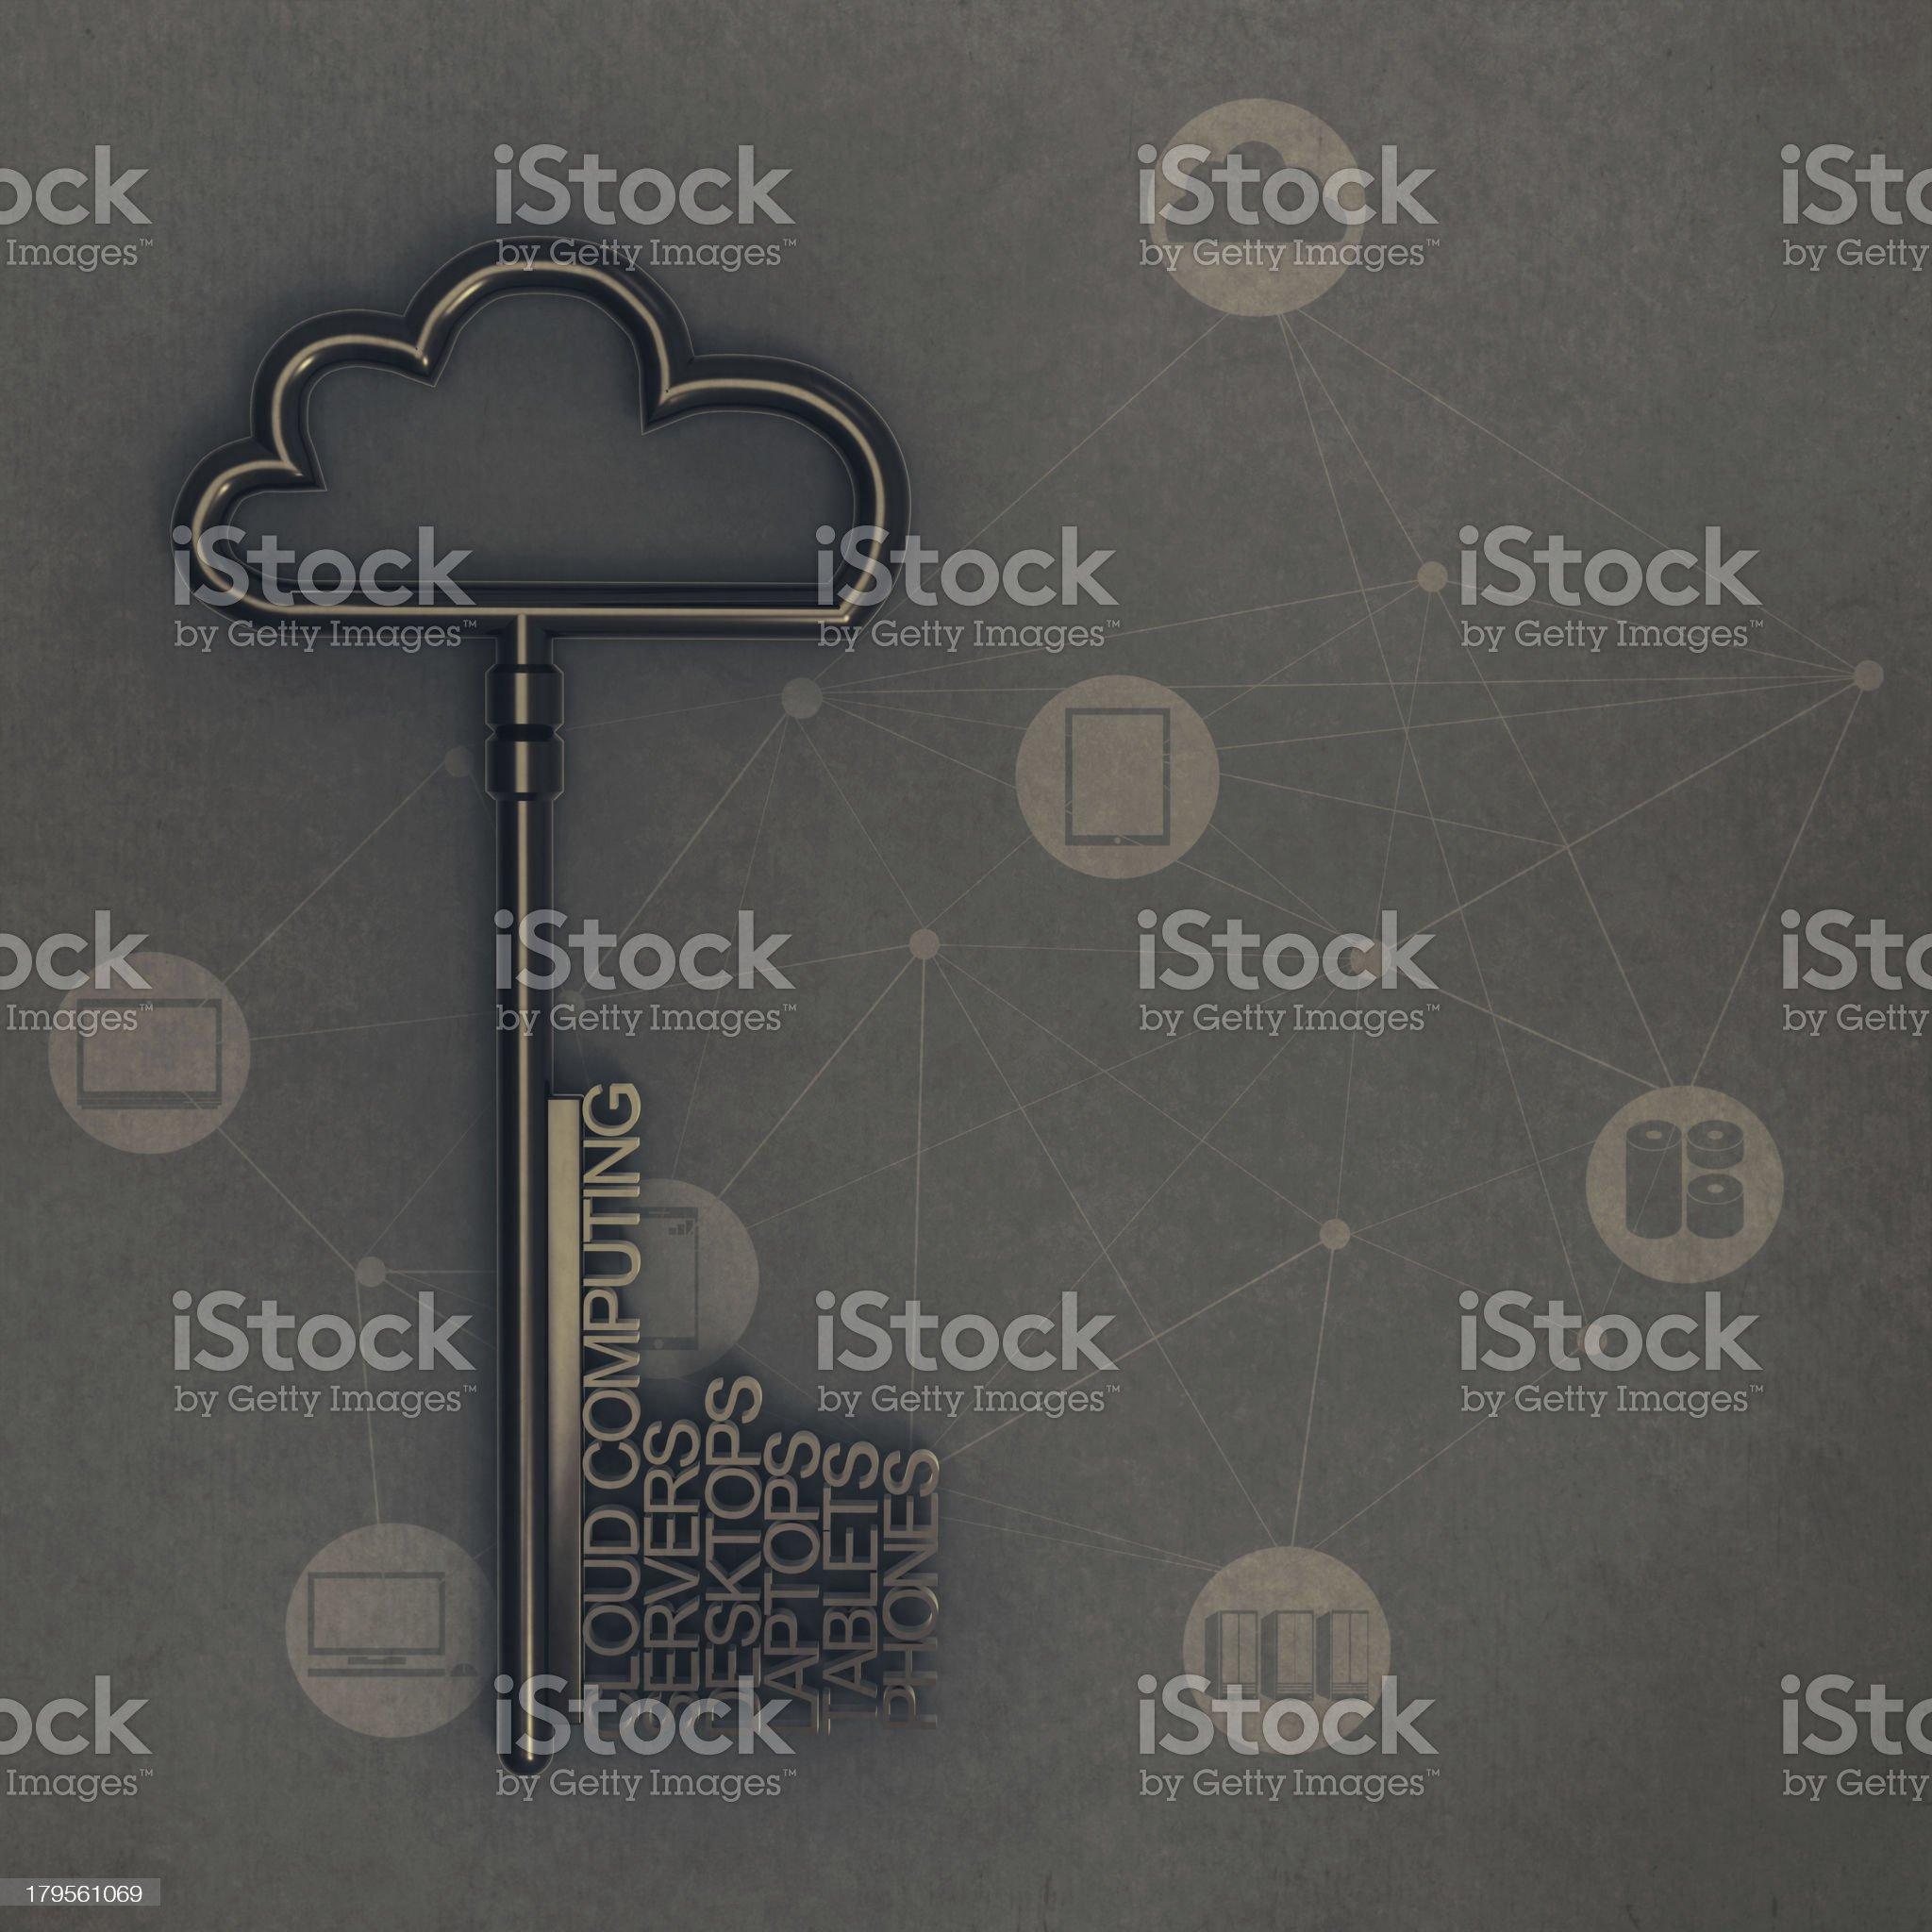 Cloud computing diagram royalty-free stock photo